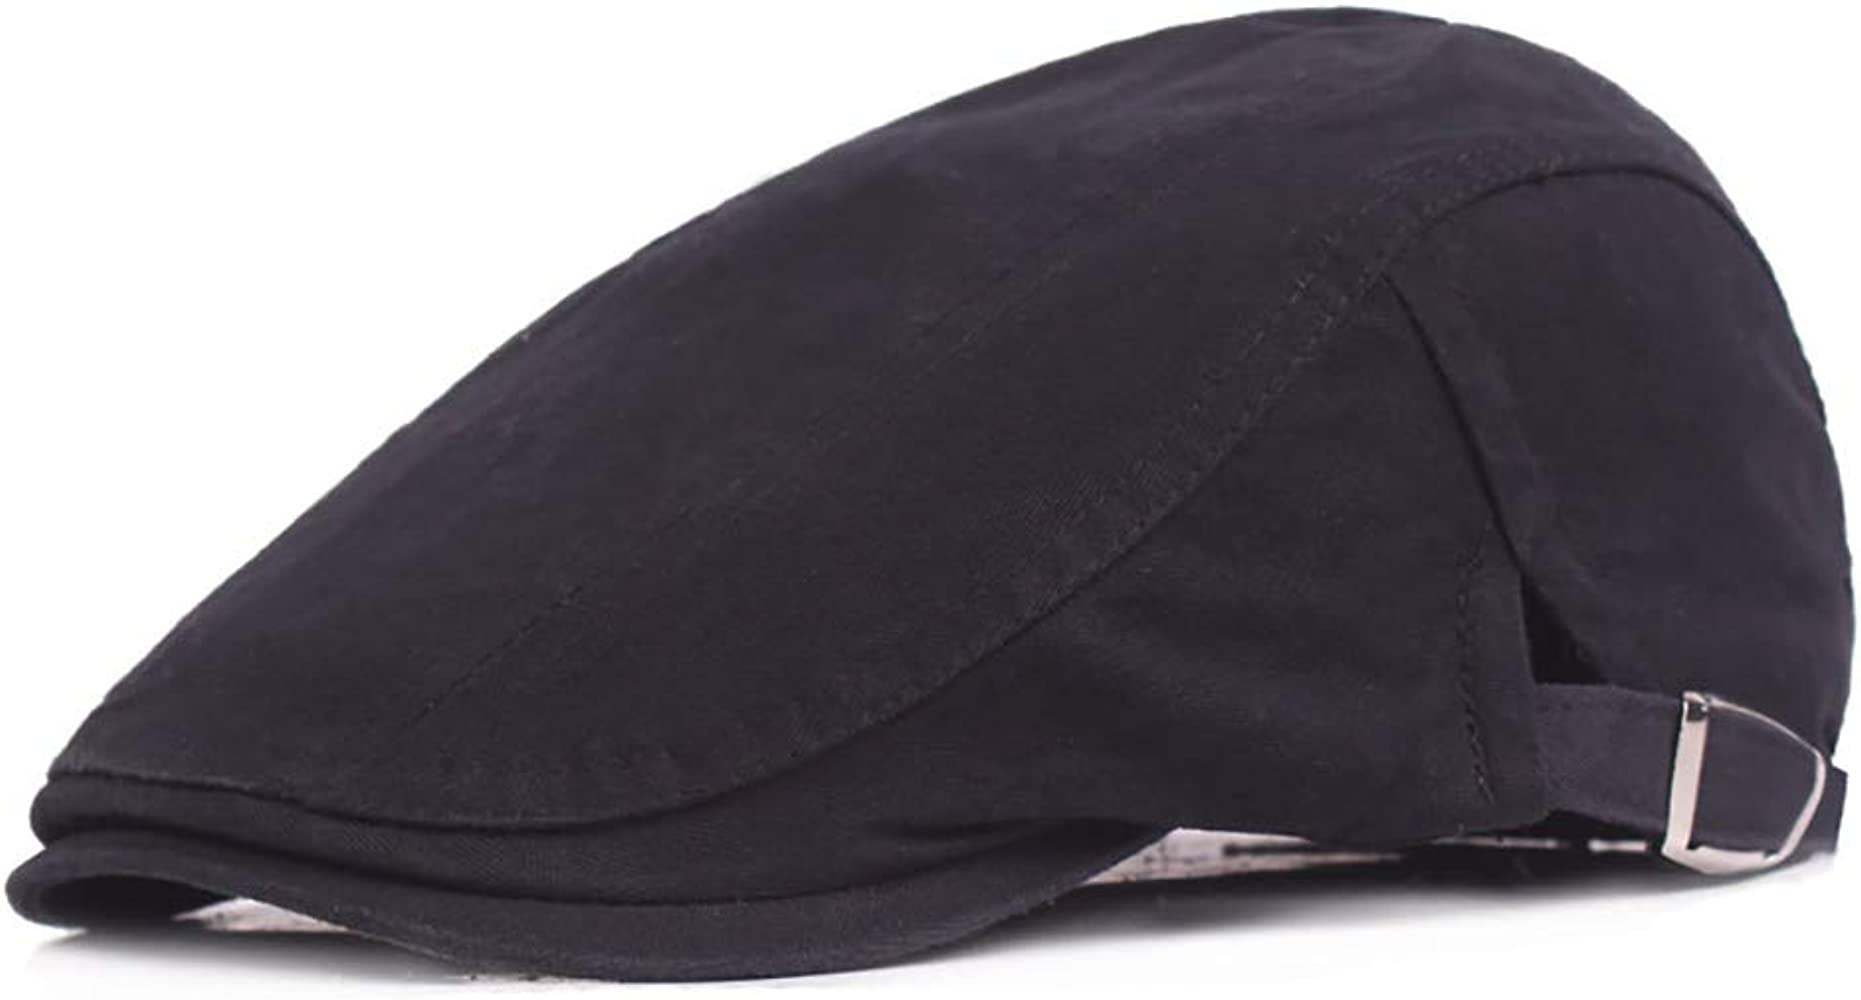 Color : 2, Size : Free Size MUMUWU Caps Men Cotton Adjustable Flat Cap Quilted Duckbill Newsboy Gatsby Irish Hat Hat